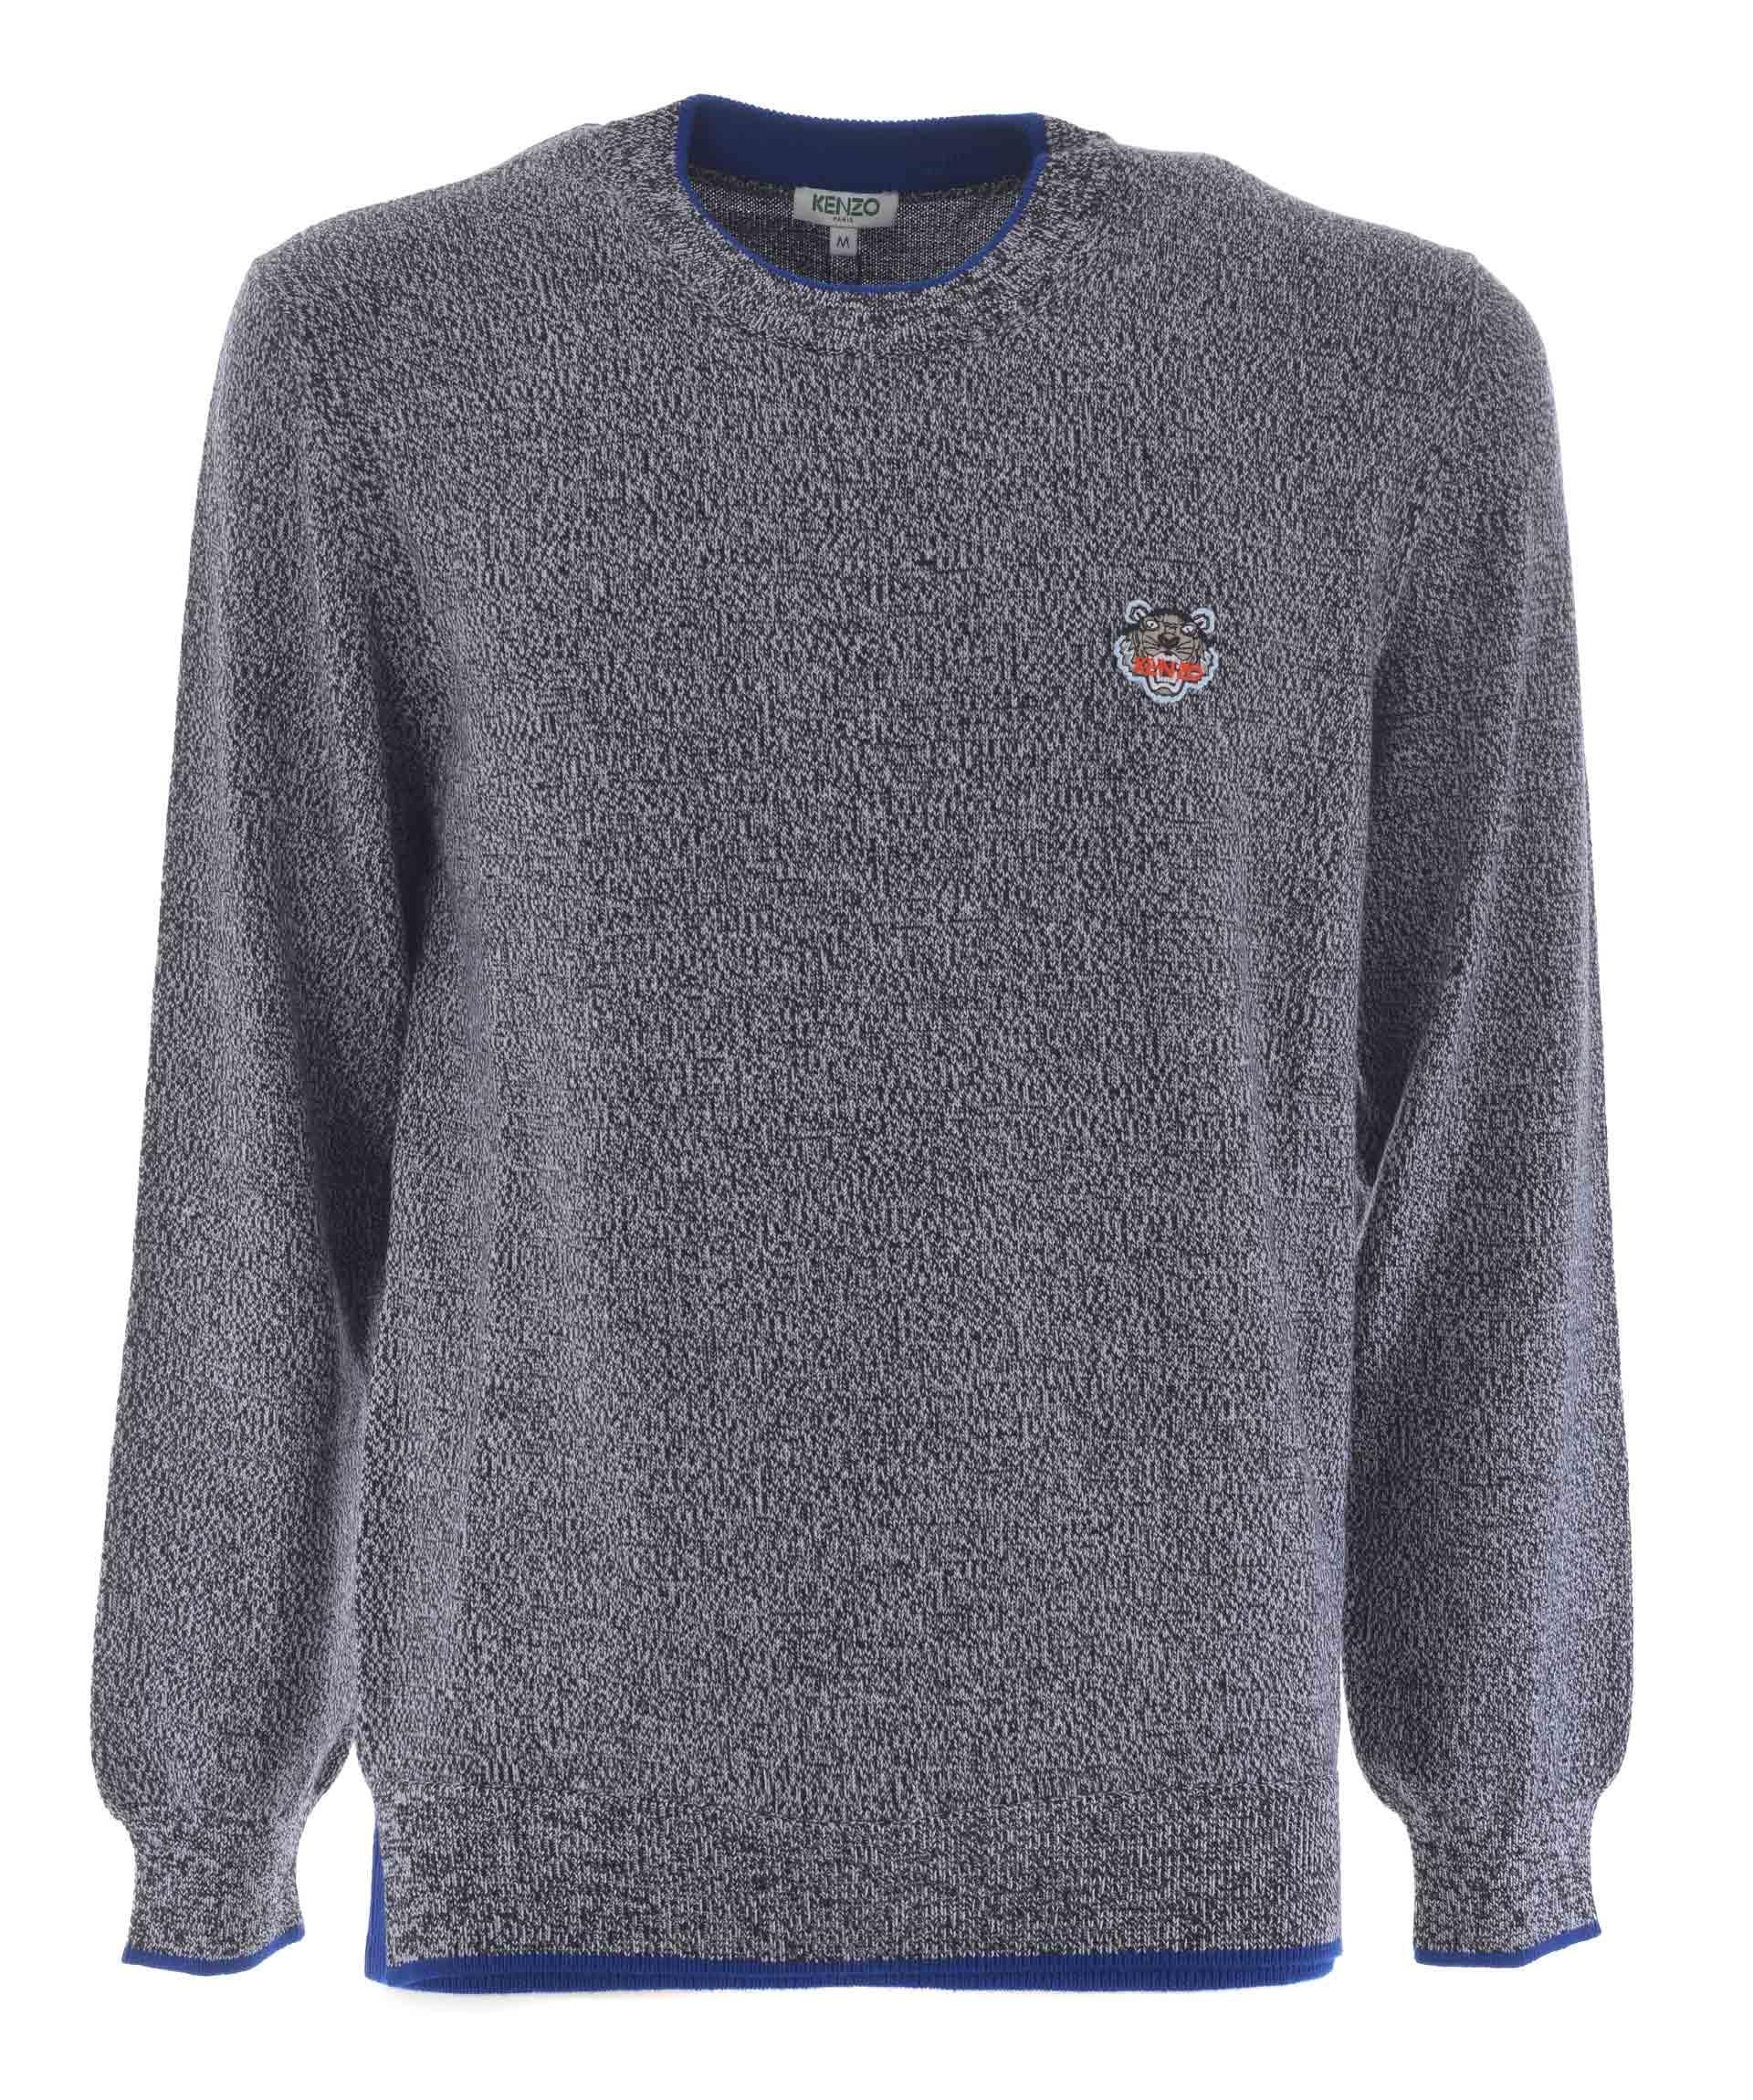 Kenzo Tiger Crest Sweater In Grigio Scuro Melange